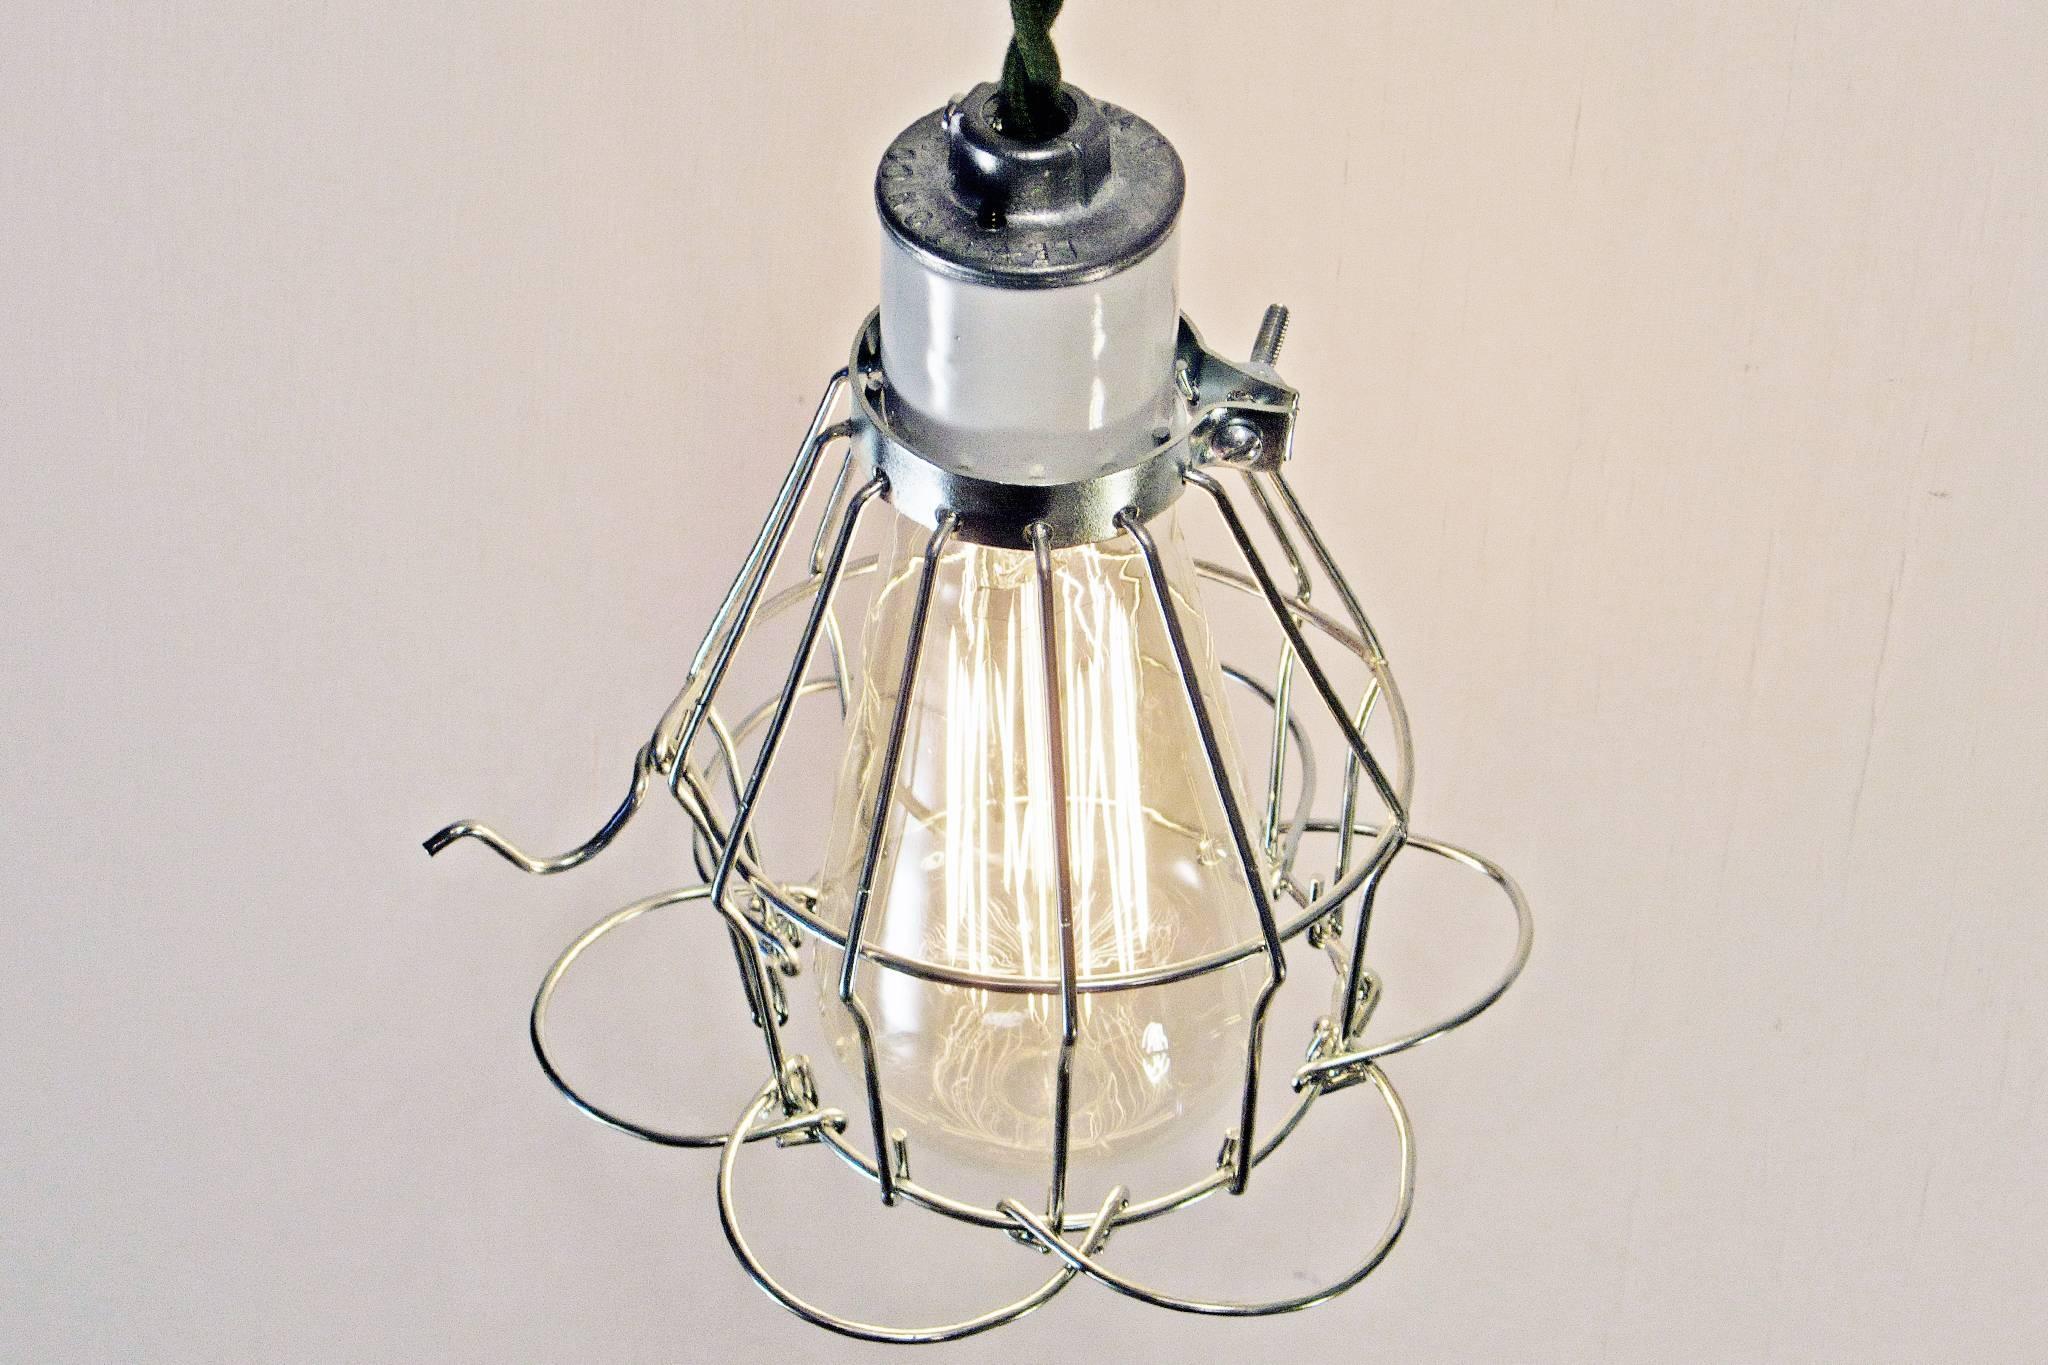 Pendant Lighting : Luxury Wire Ball Pendant Light Diy , Wire Light inside Wire Ball Pendant Lights (Image 12 of 15)